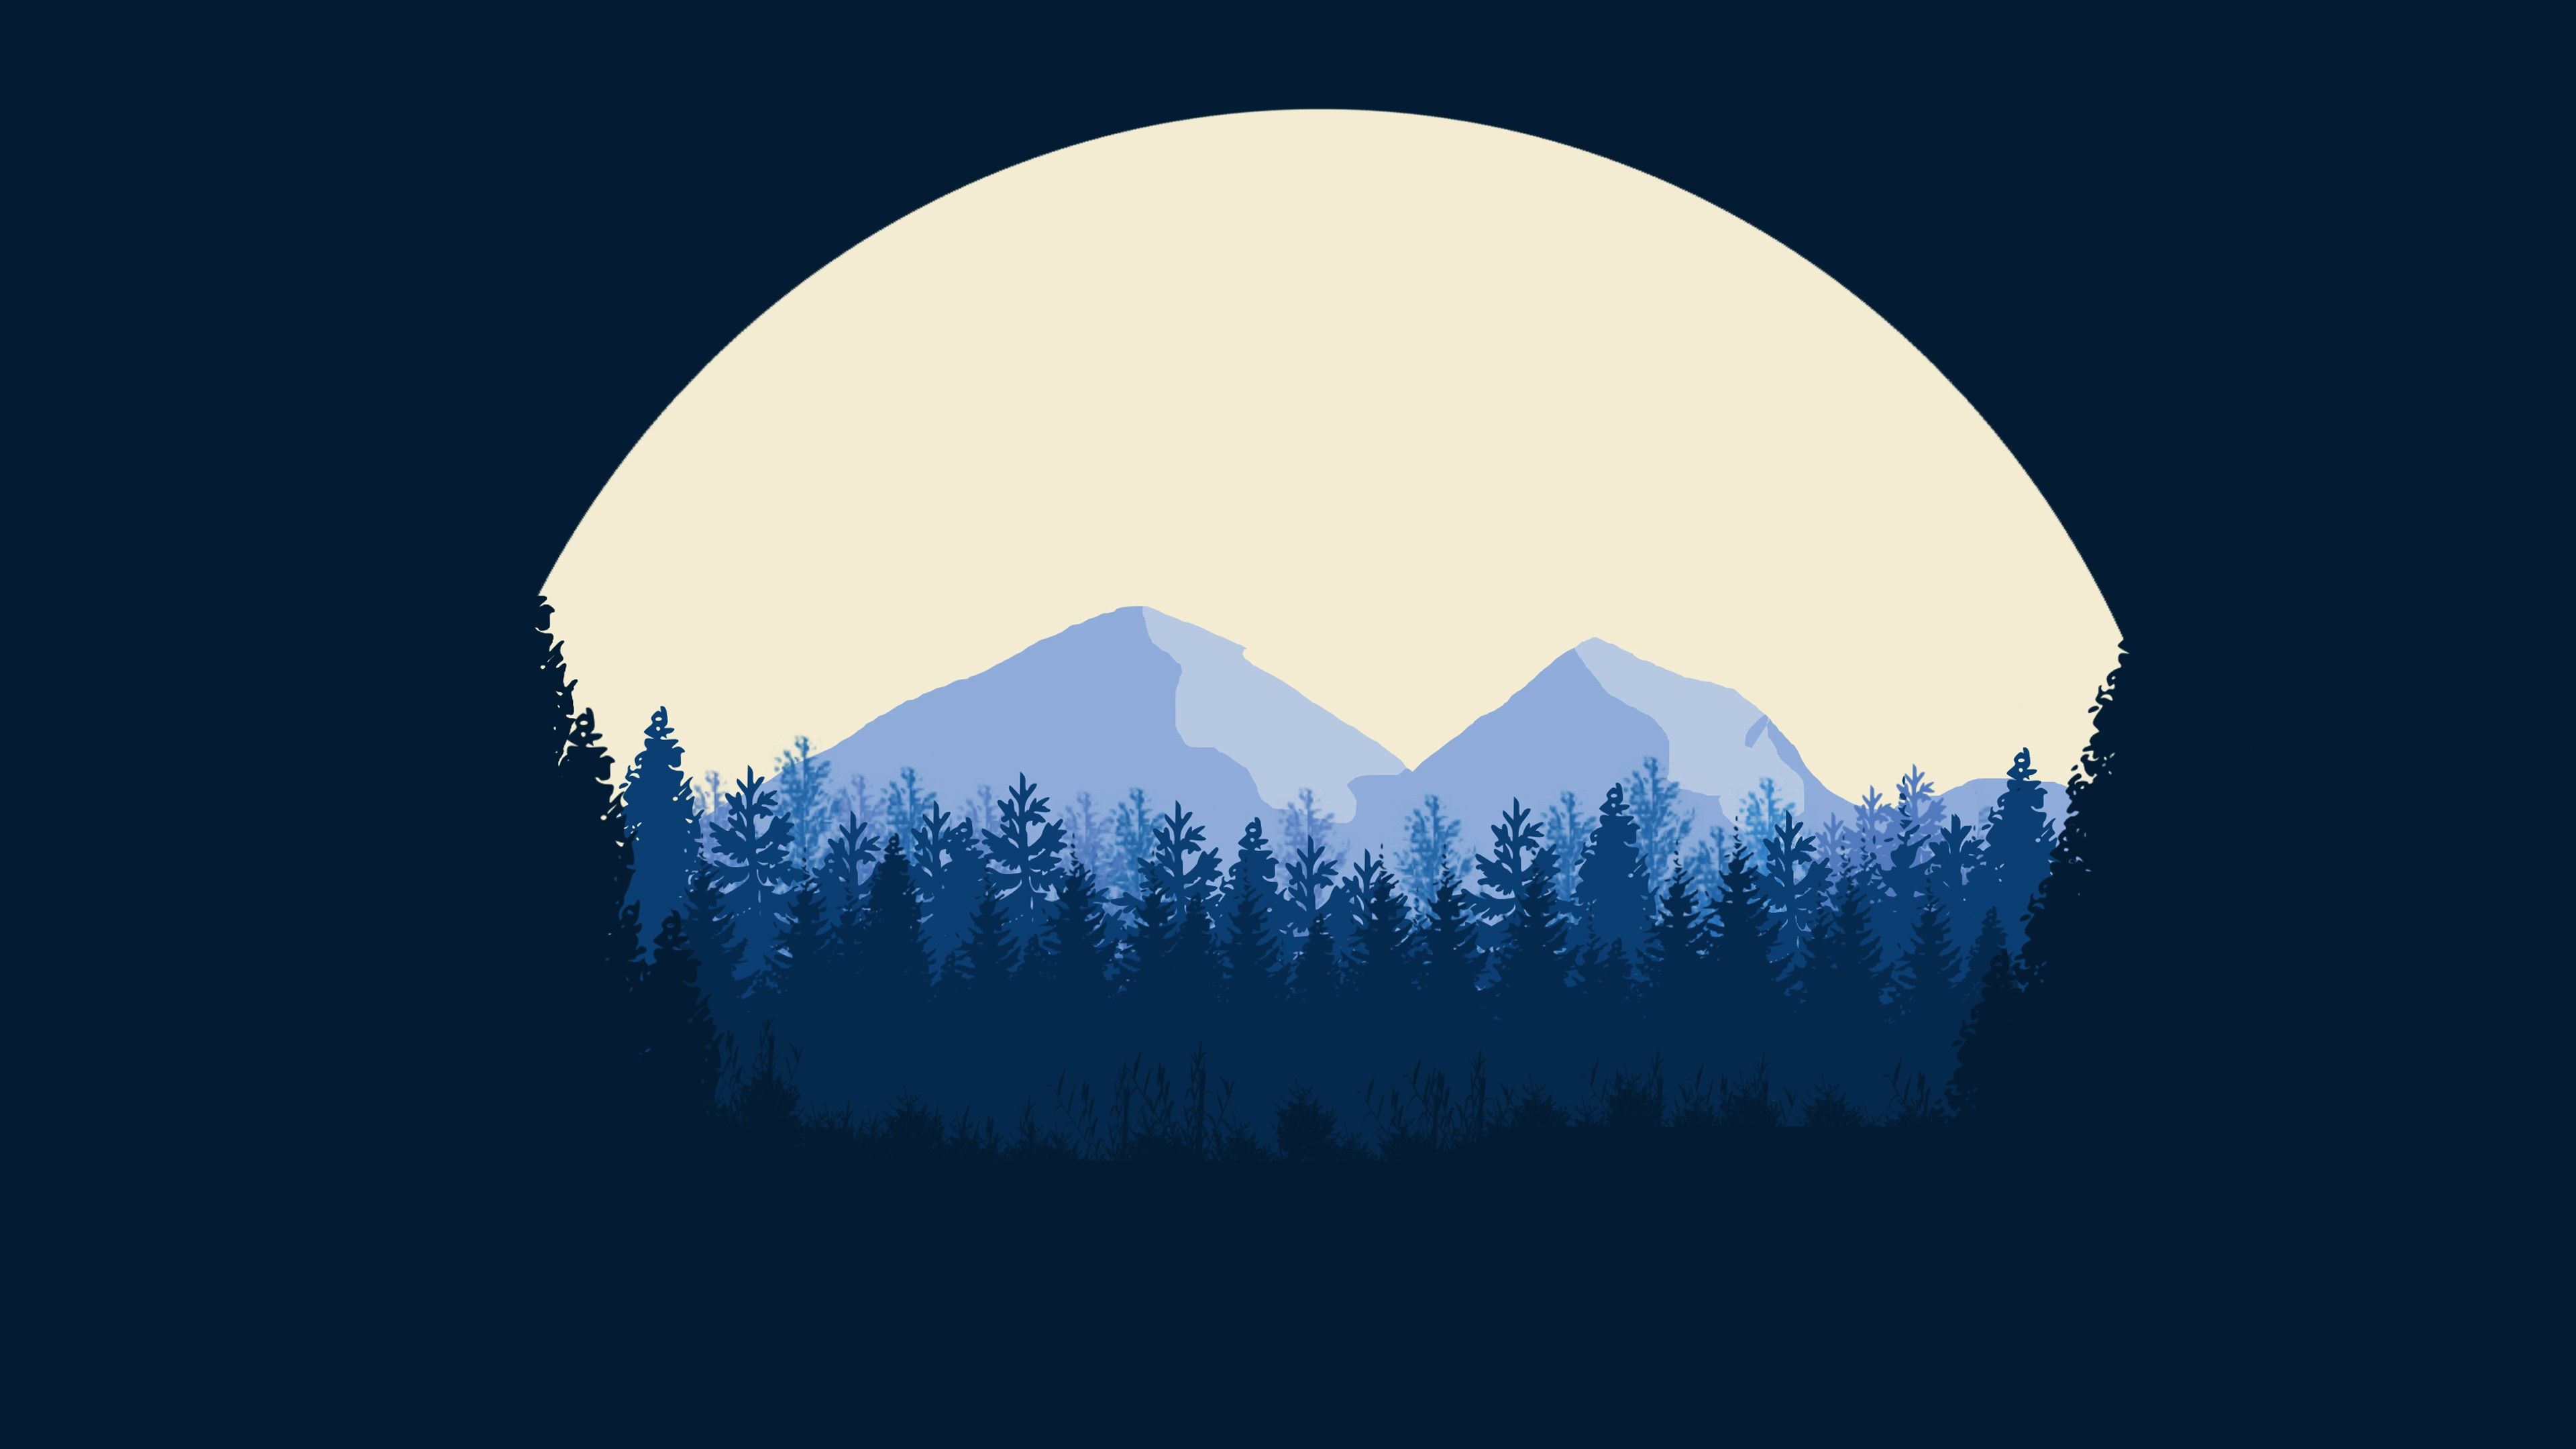 full moon forest flat wallpaper 4k by designuchiha